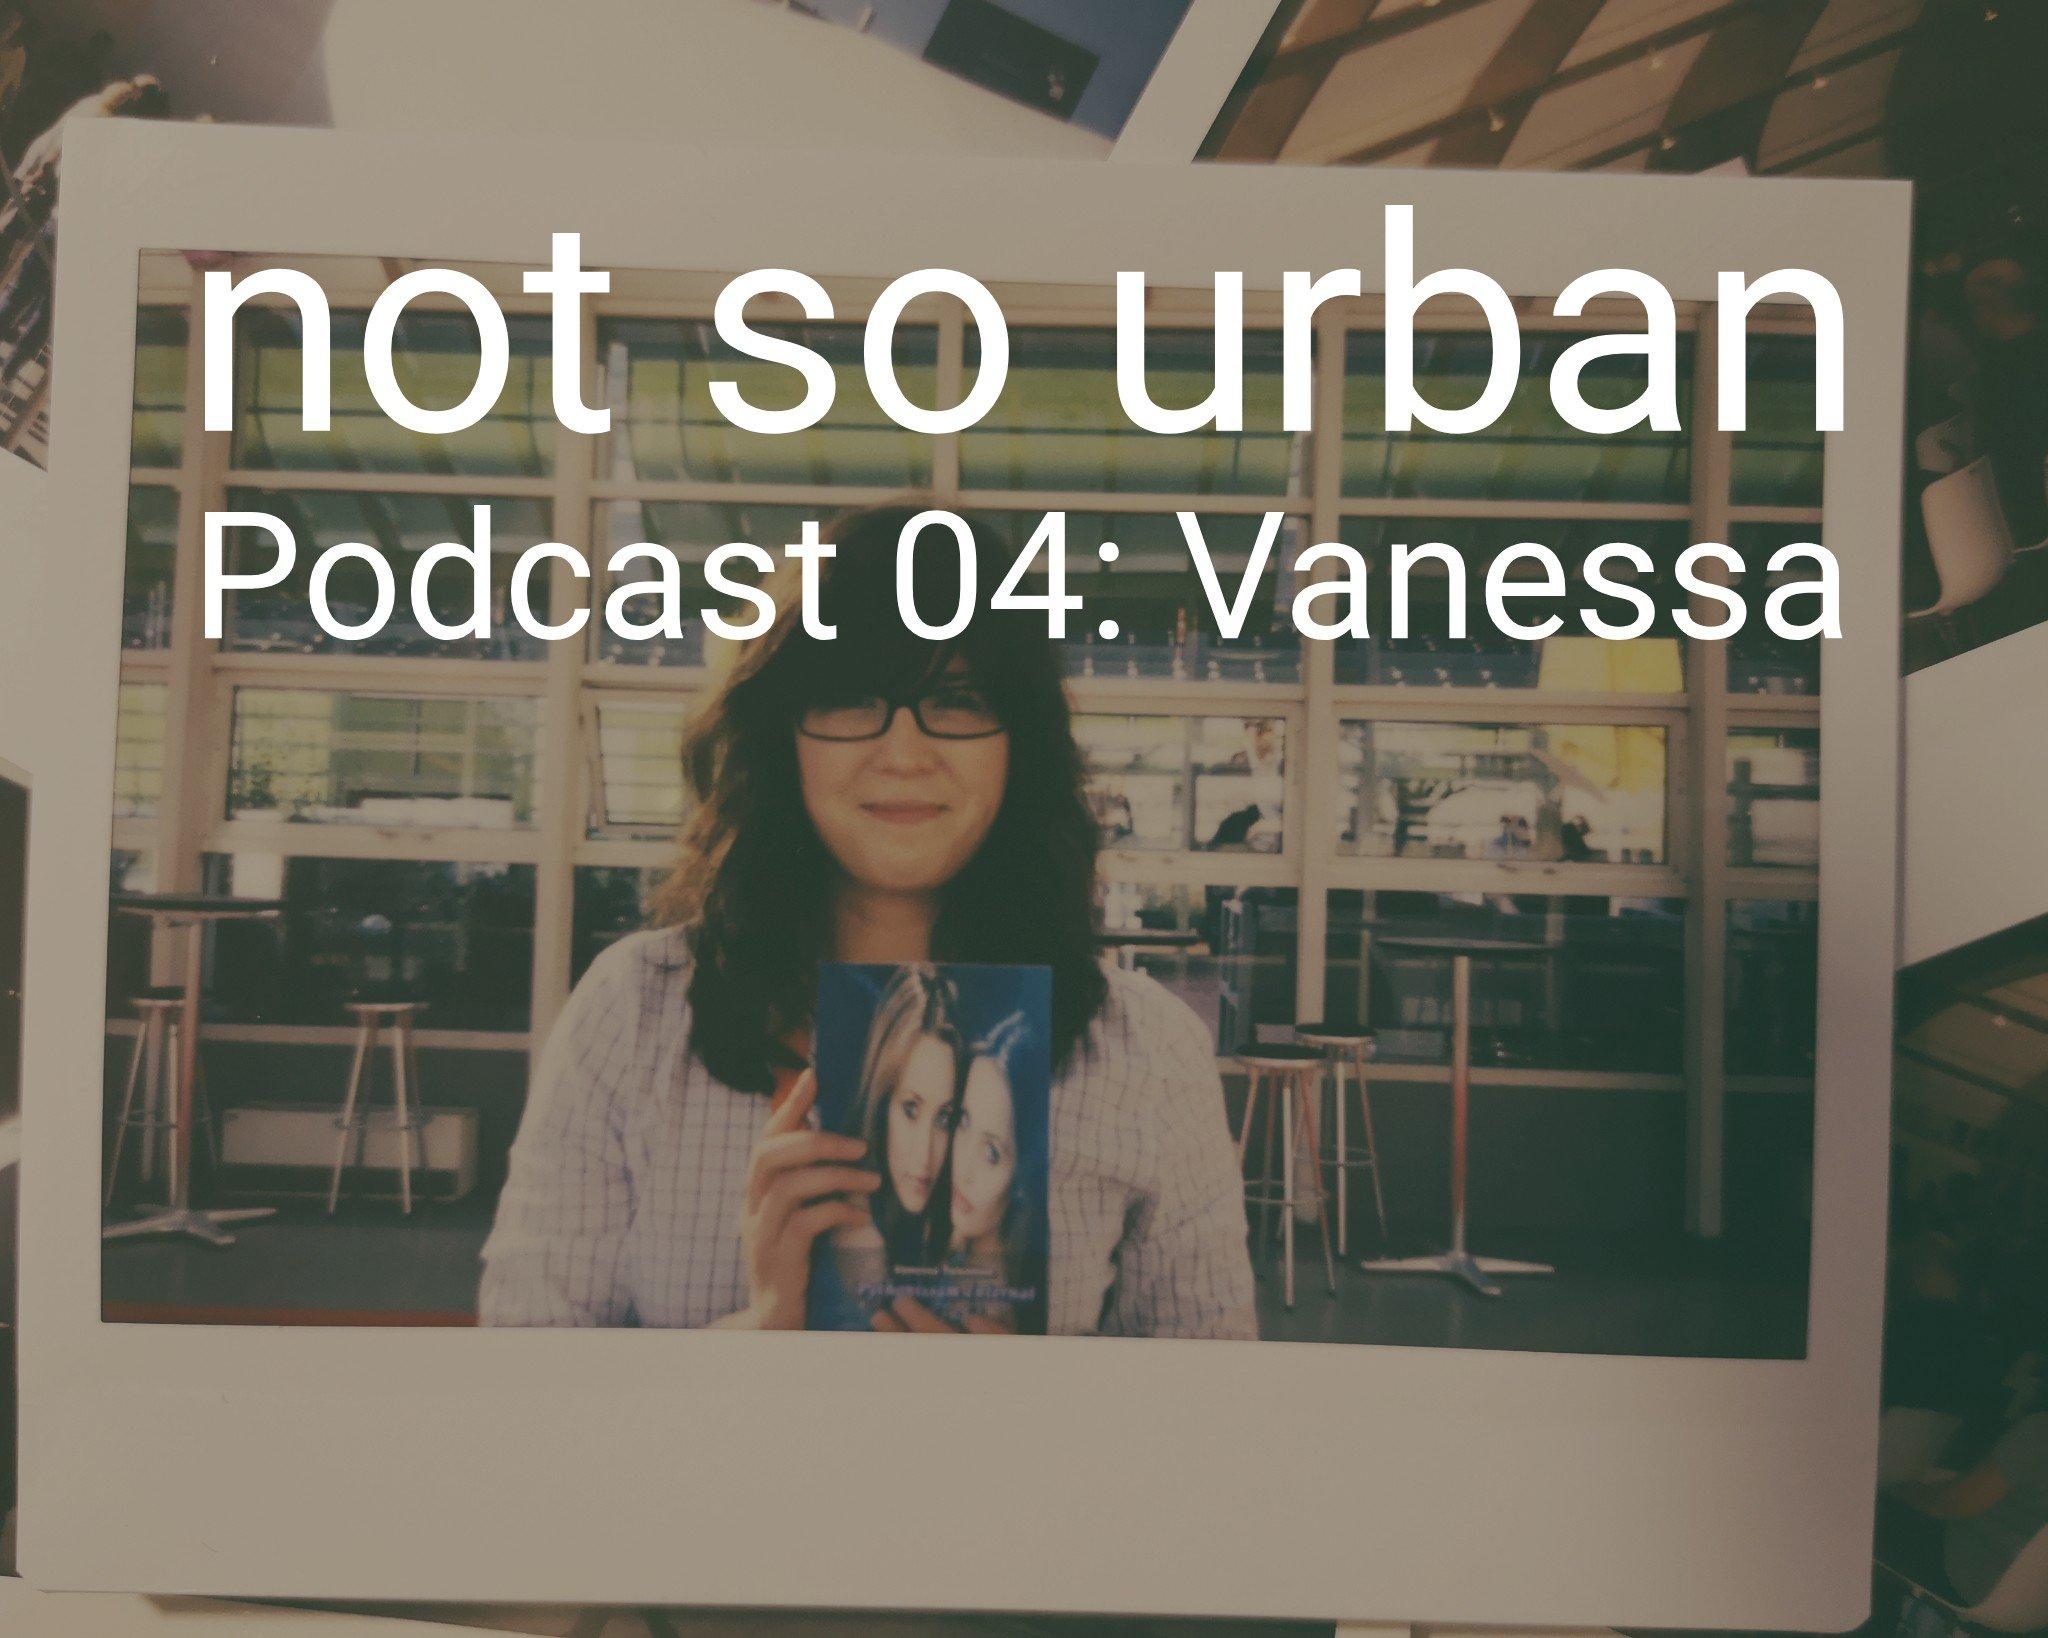 not so urban podcast nr. 5